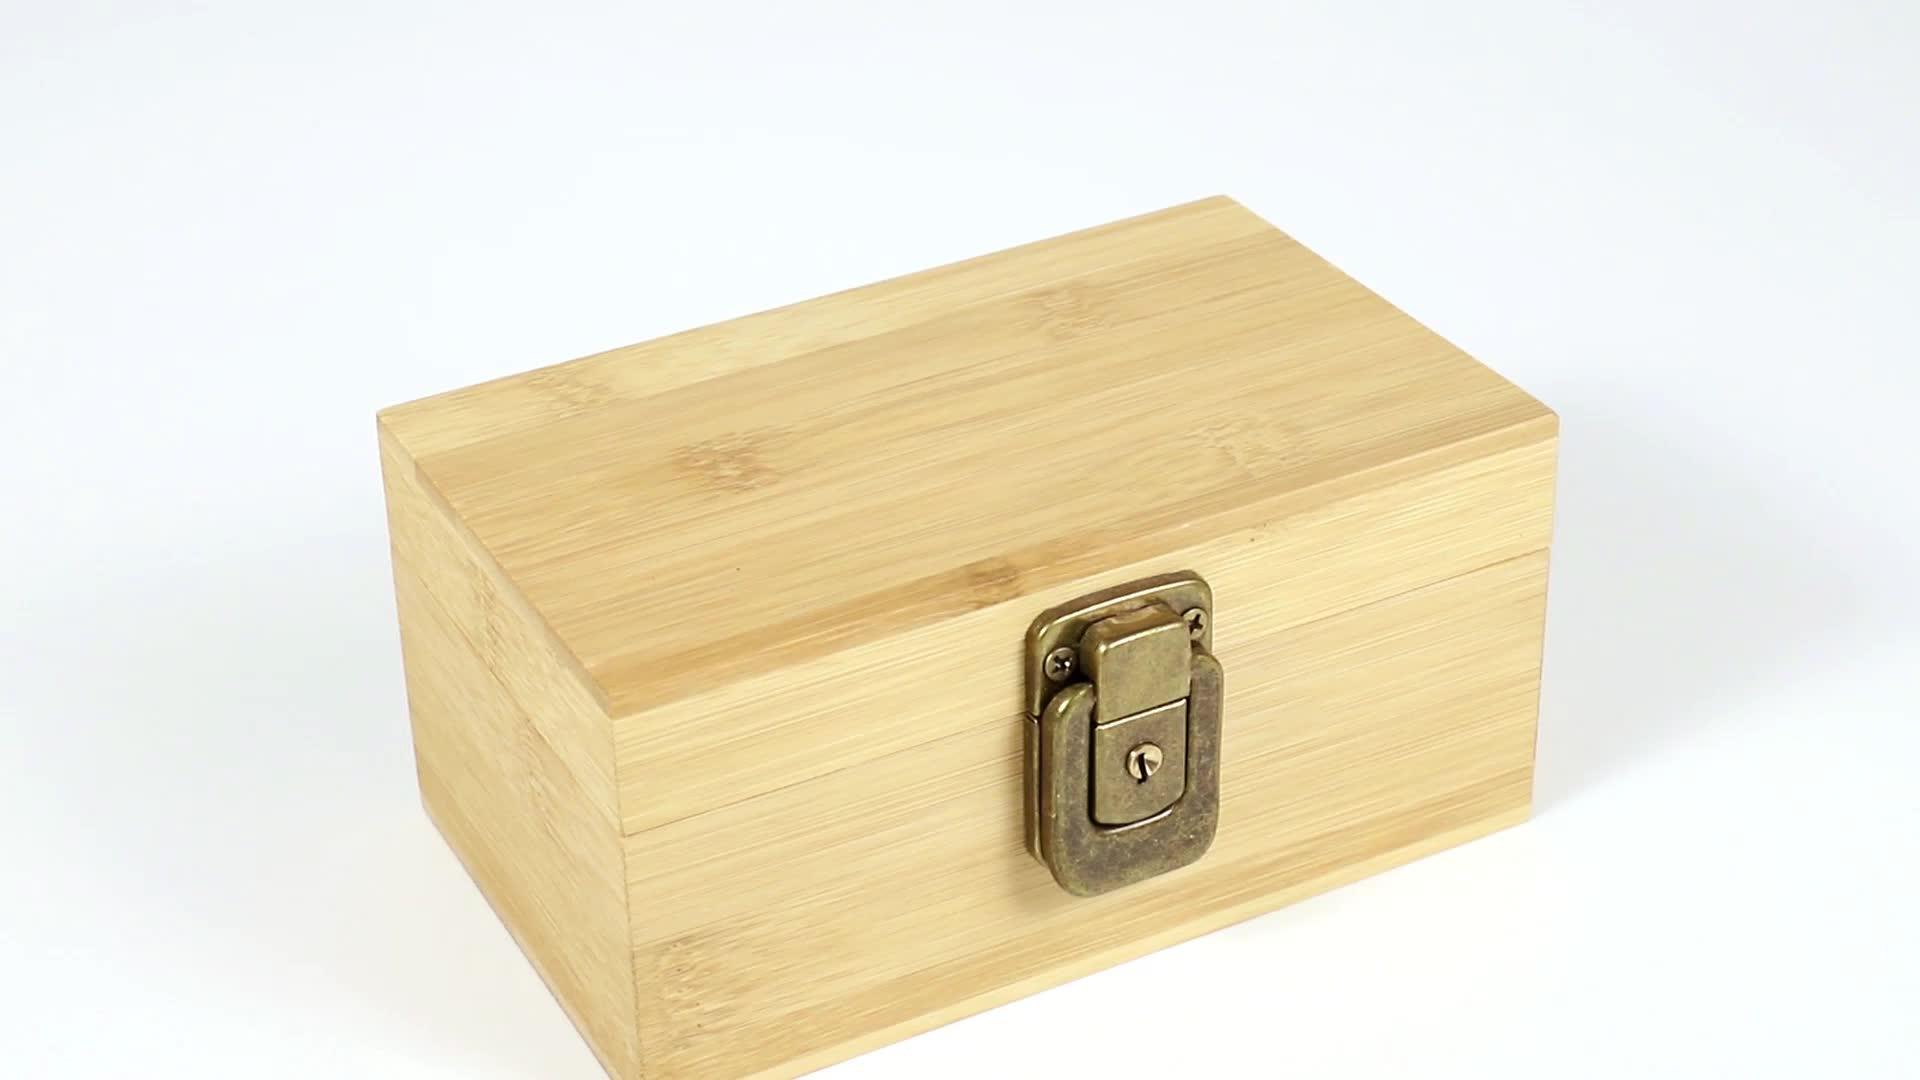 Özel küçük basit boş bambu hediye ambalaj kutusu rustik ahşap kutu